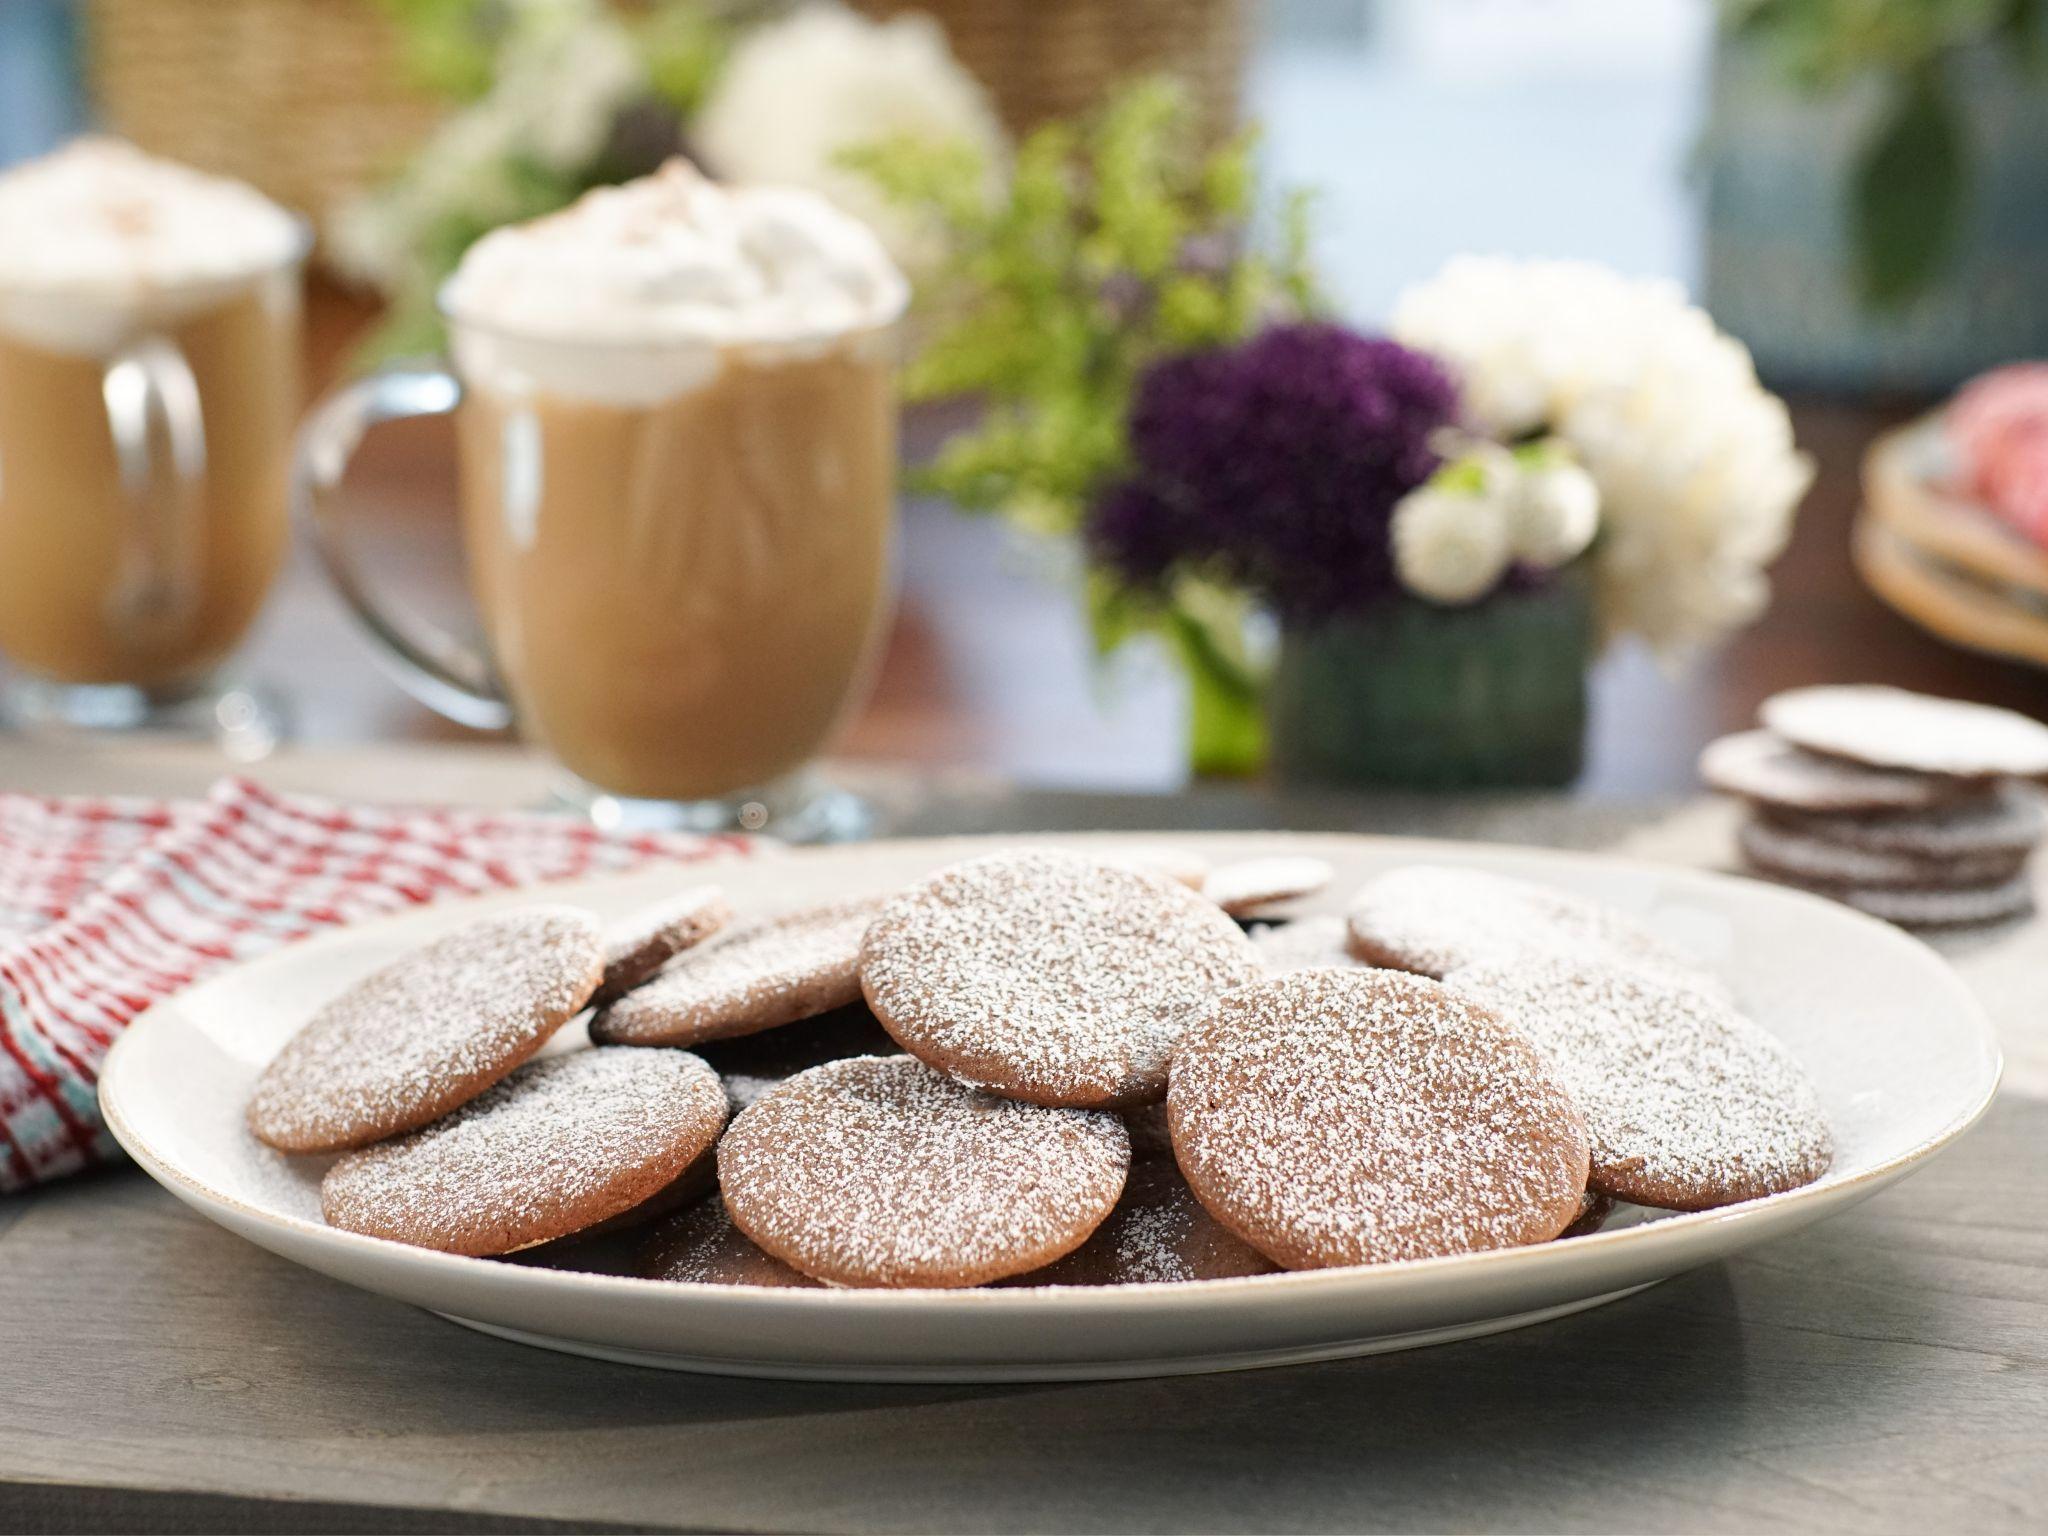 Crispy Chocolate Mint Cookies Recipe Chocolate Mint Cookies Mint Cookies Recipes Food Network Recipes